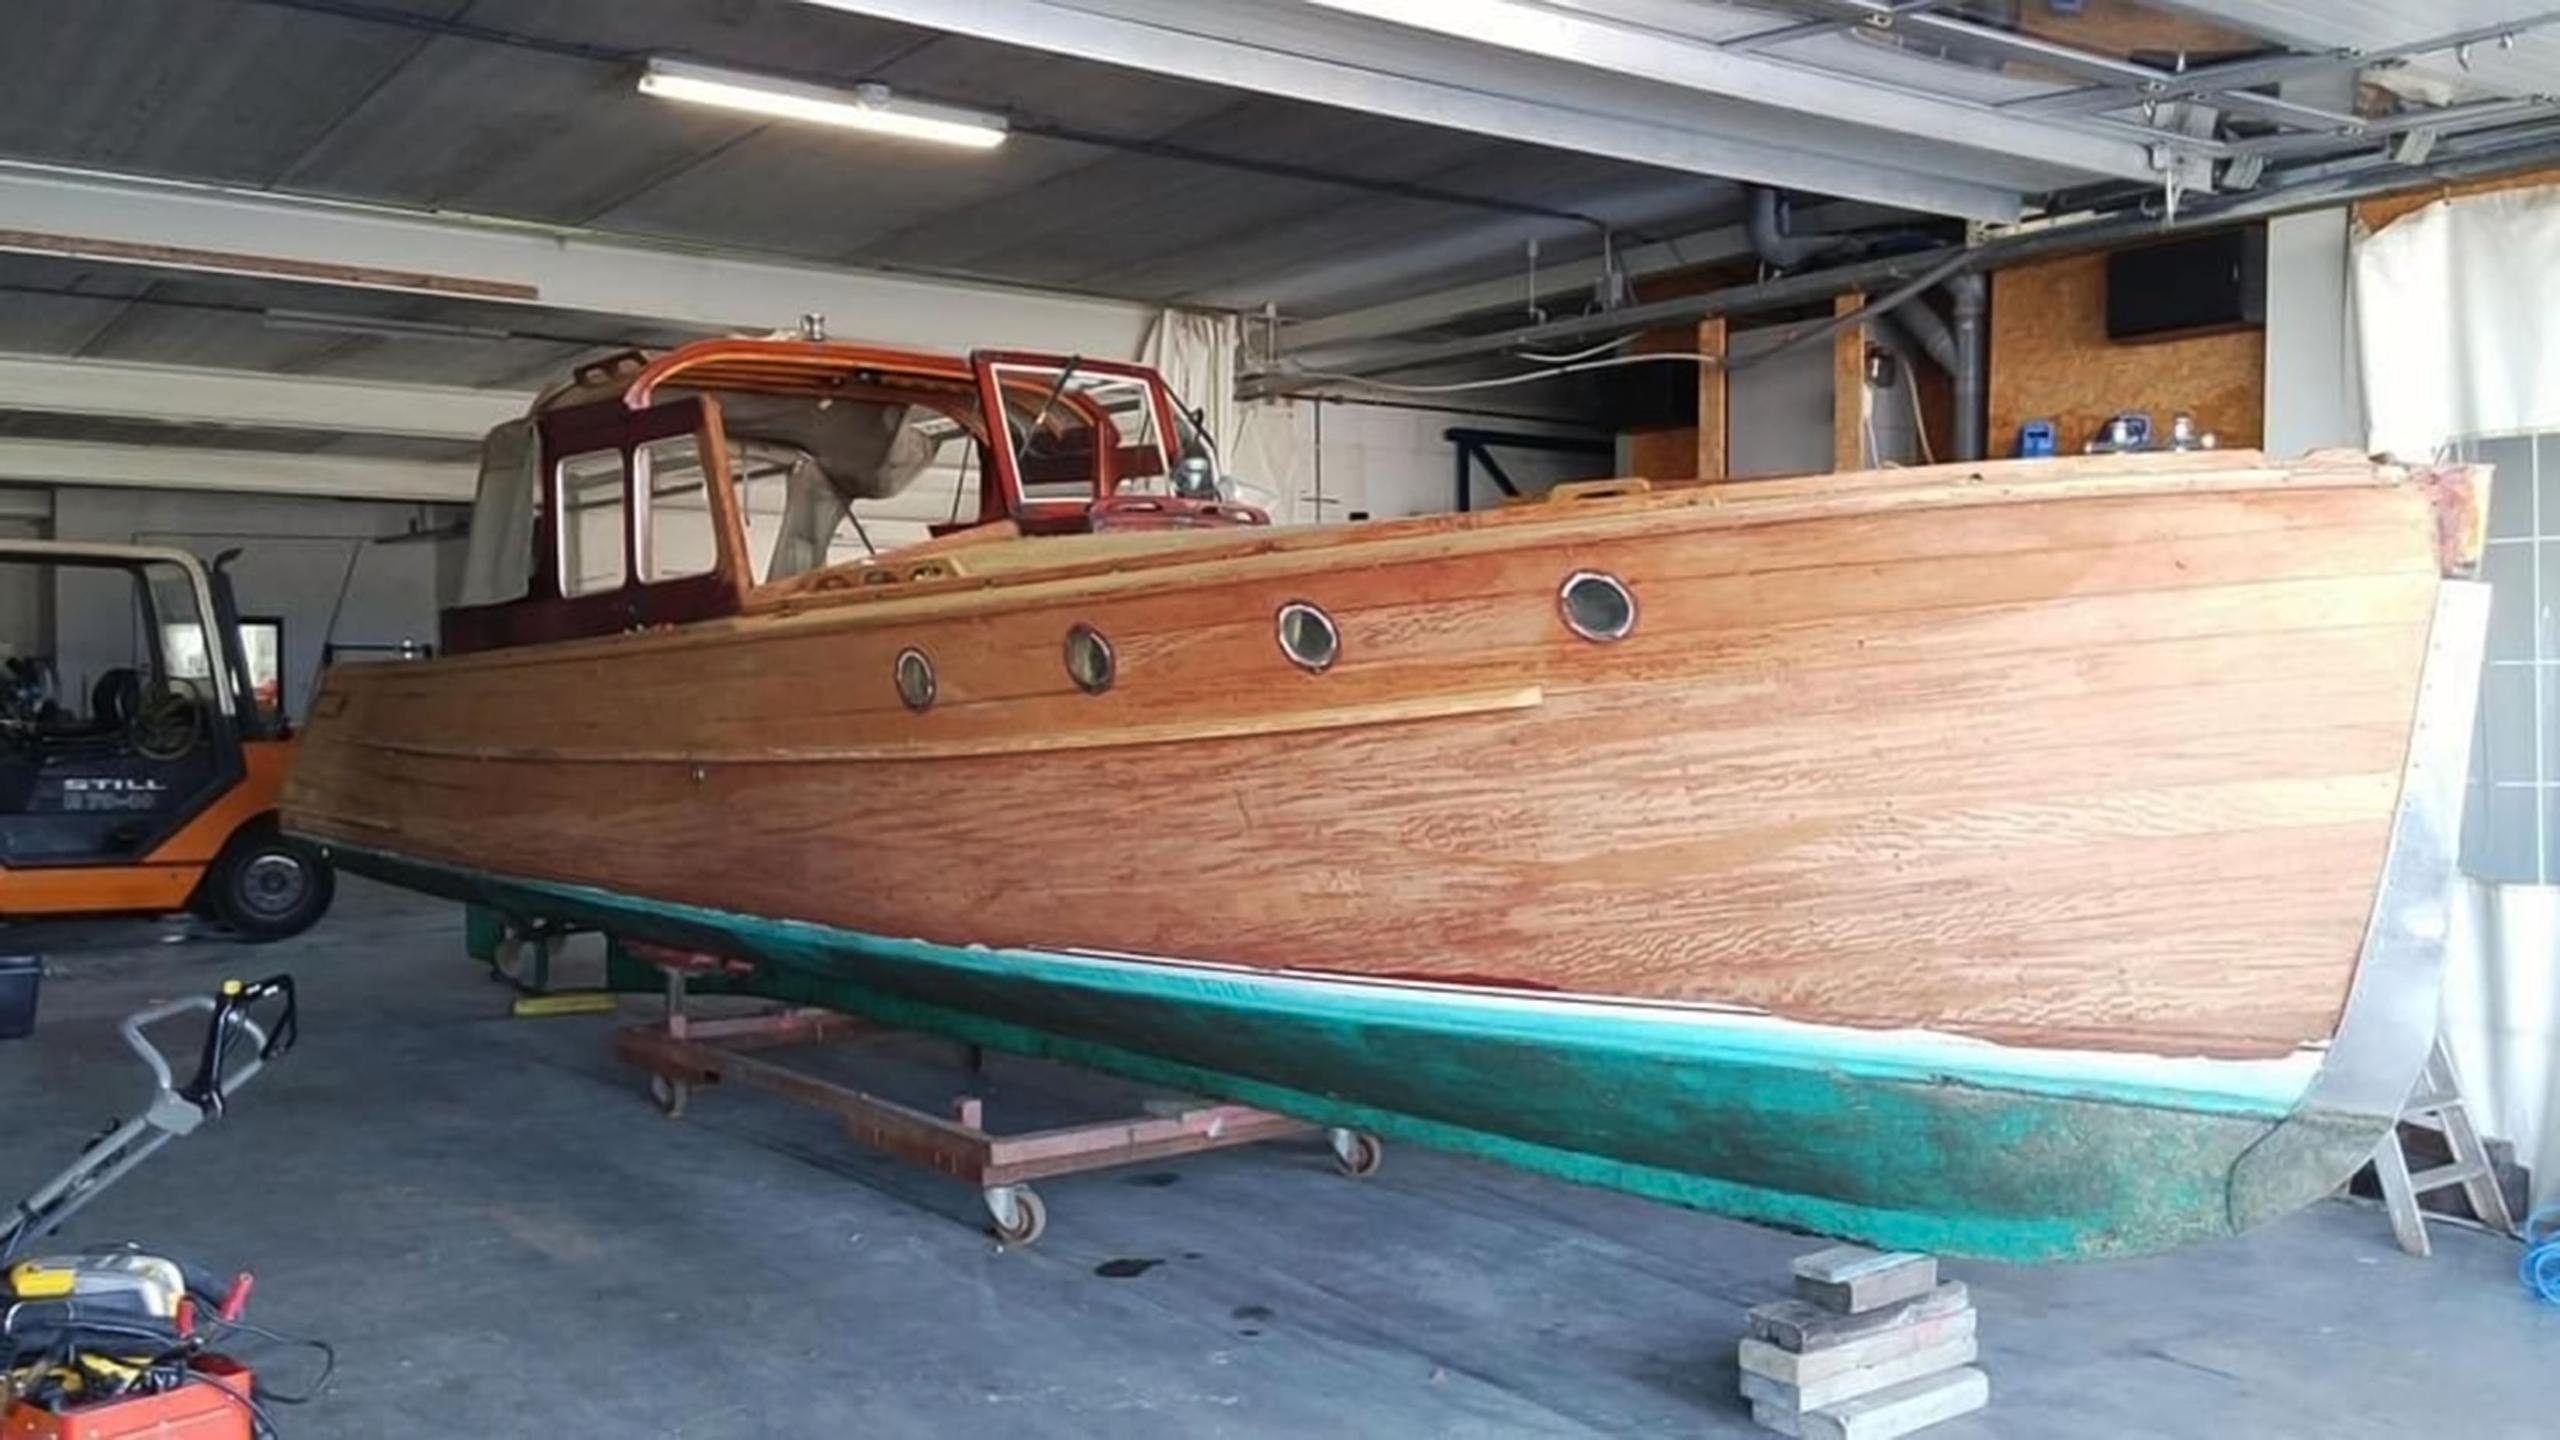 Jachtschilder Friesland-jacht-houten-boot-sloep-Coelan-bootlak-jachtlak-classic-yacht-painters